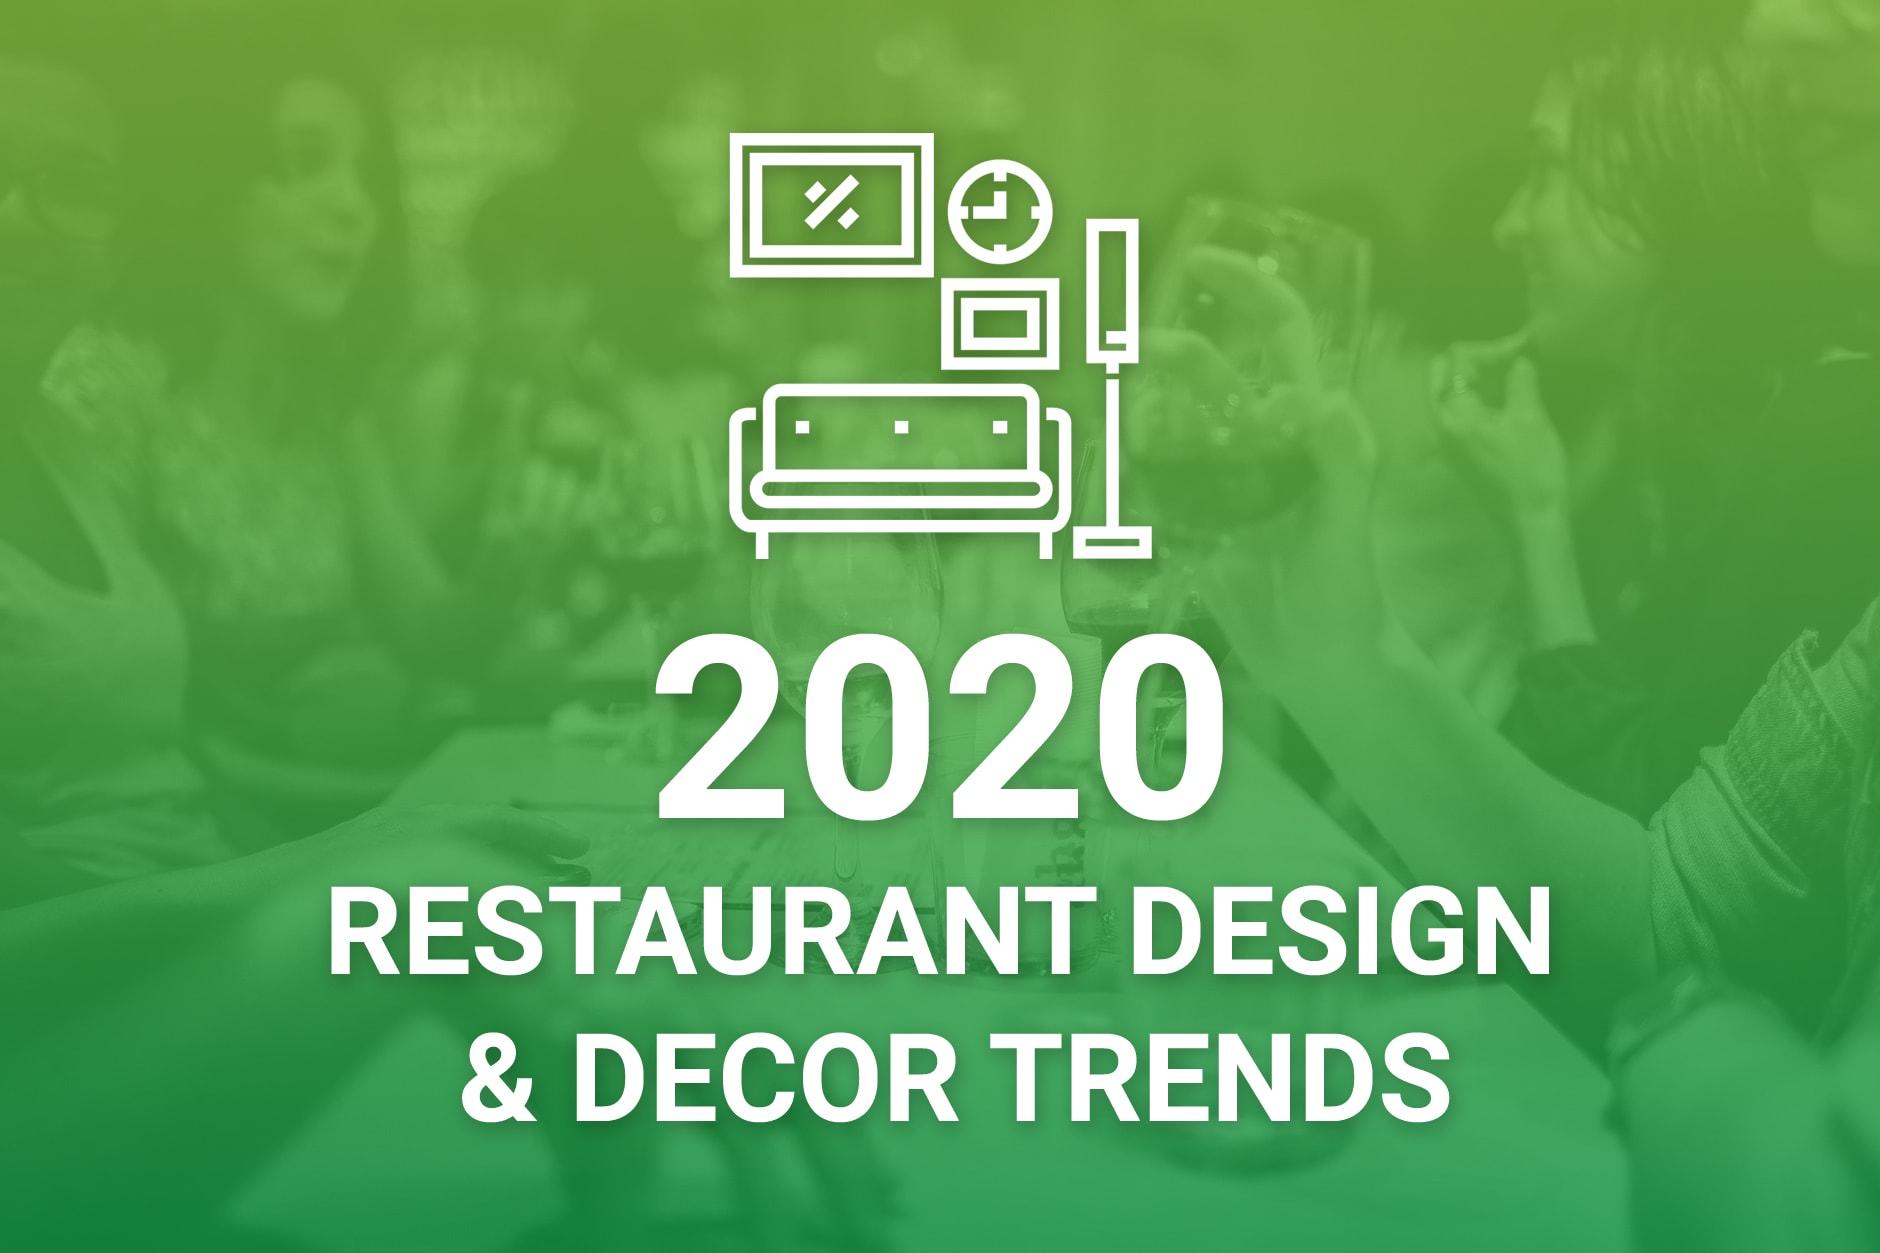 Restaurant Design & Decor Trends